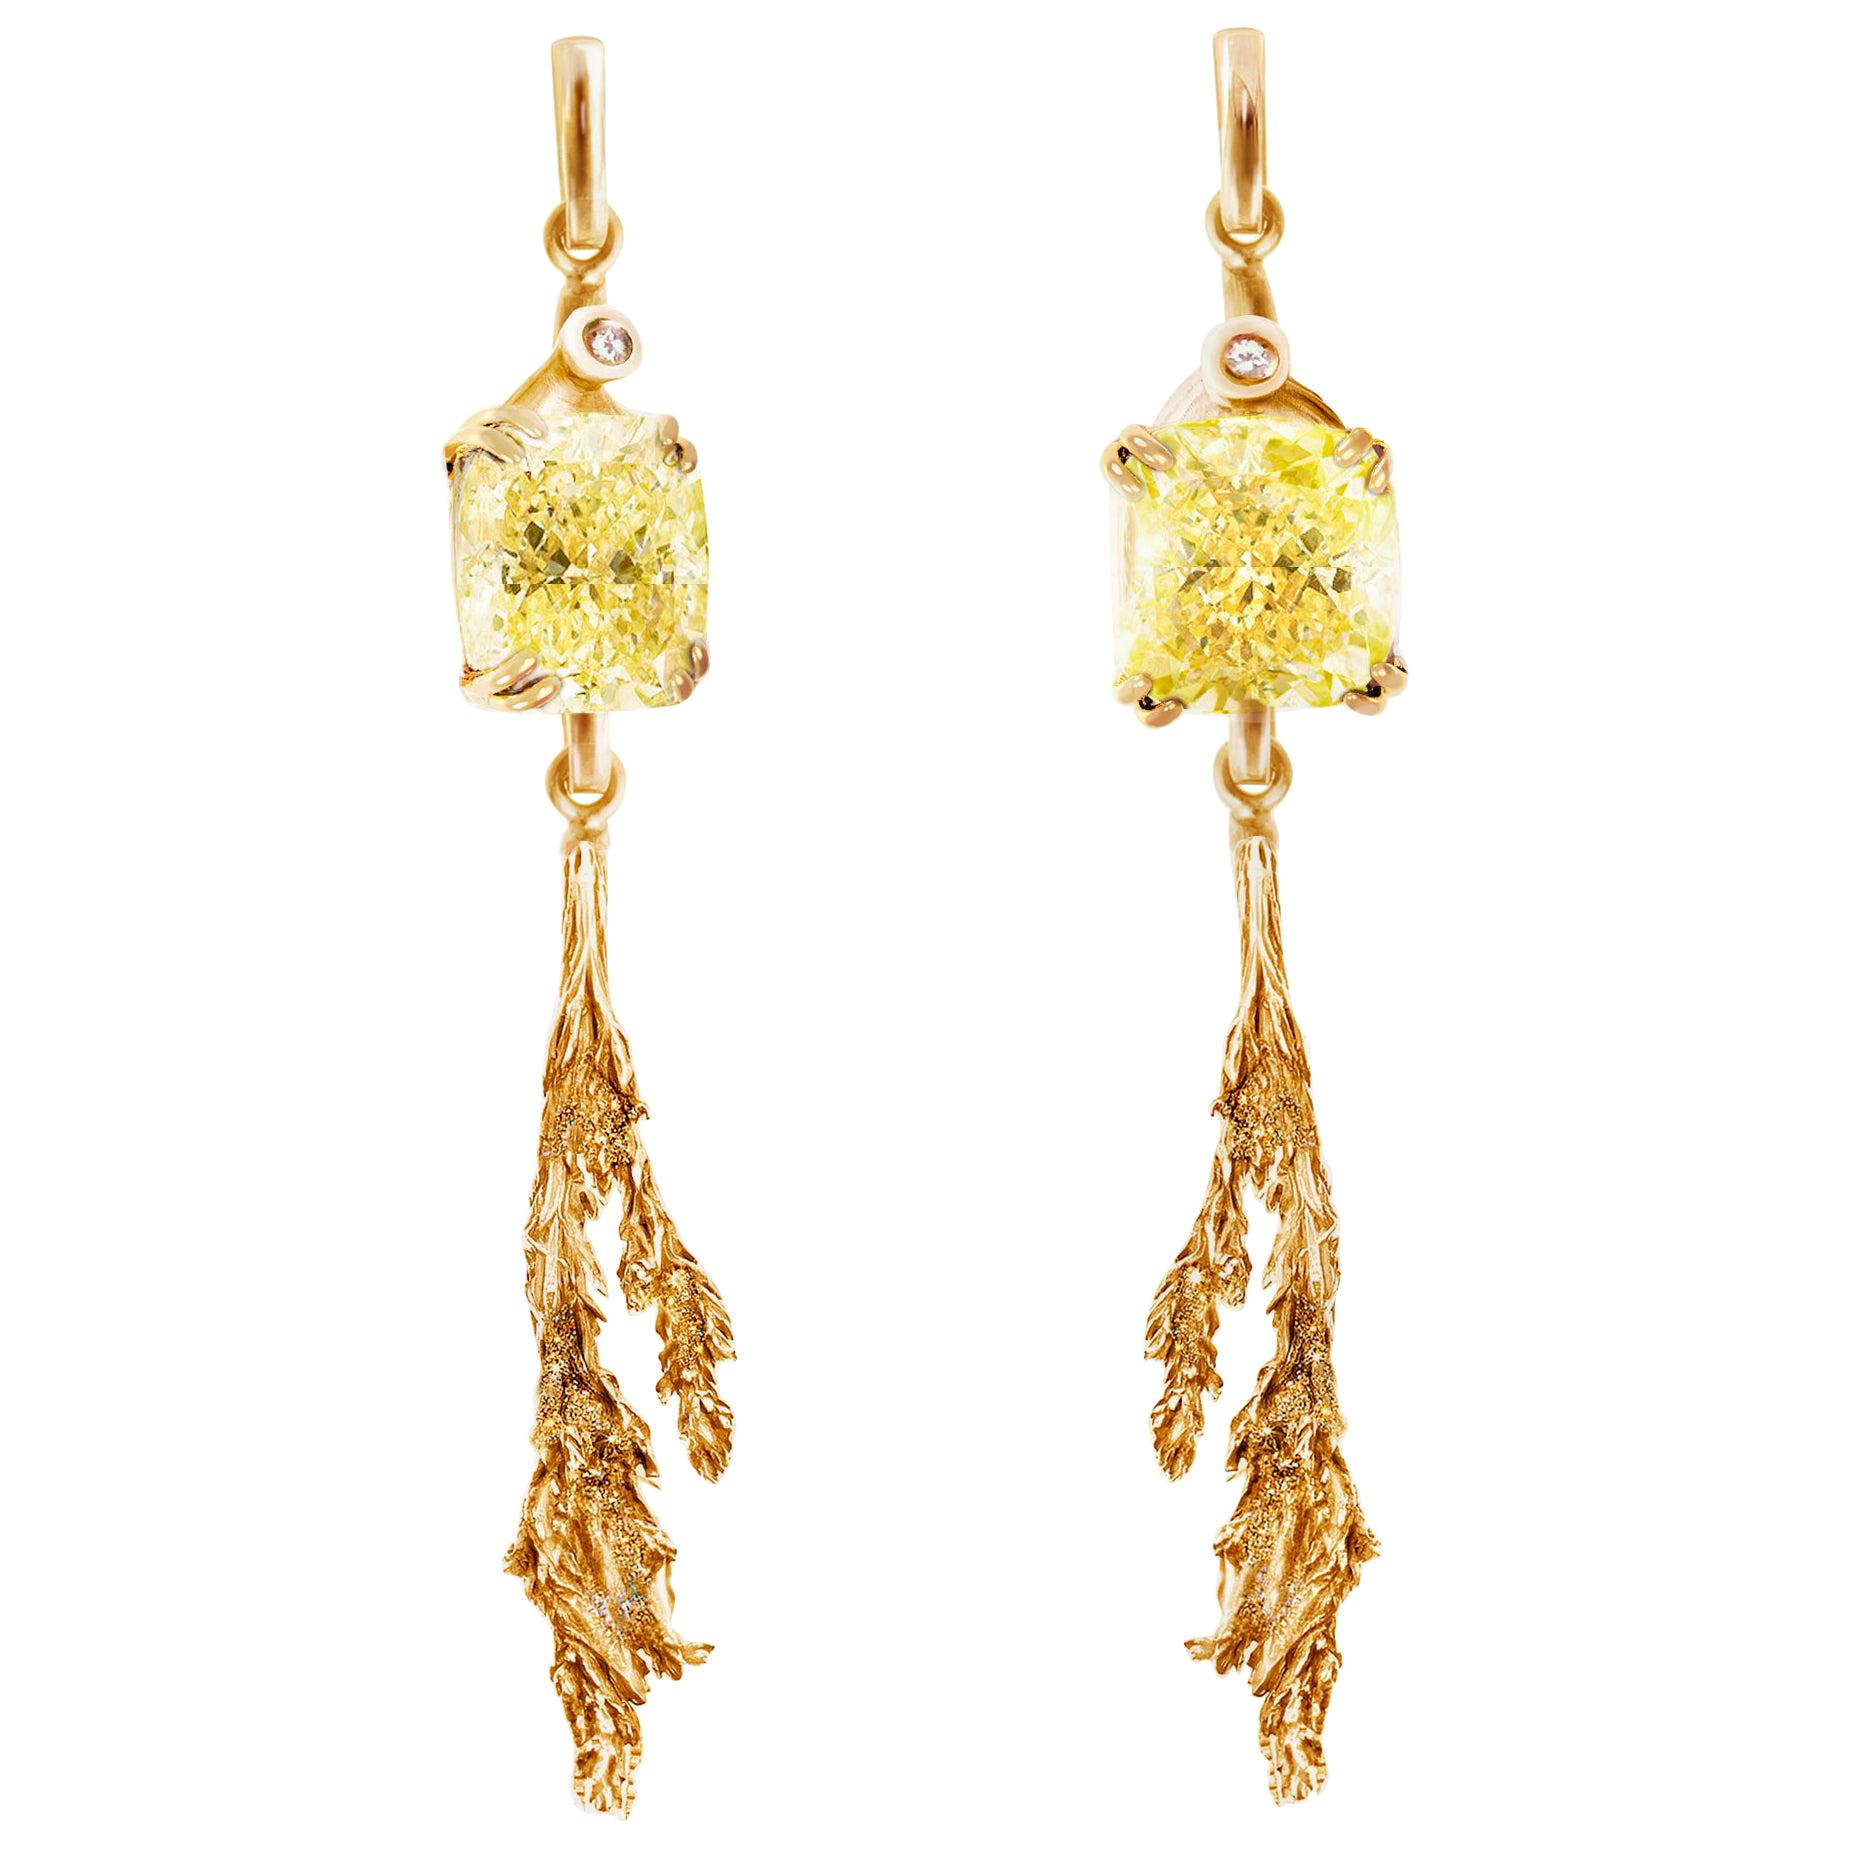 18 Karat Rose Gold Clip-On Earrings with GIA Cert. 4 Carat Yellow Diamonds